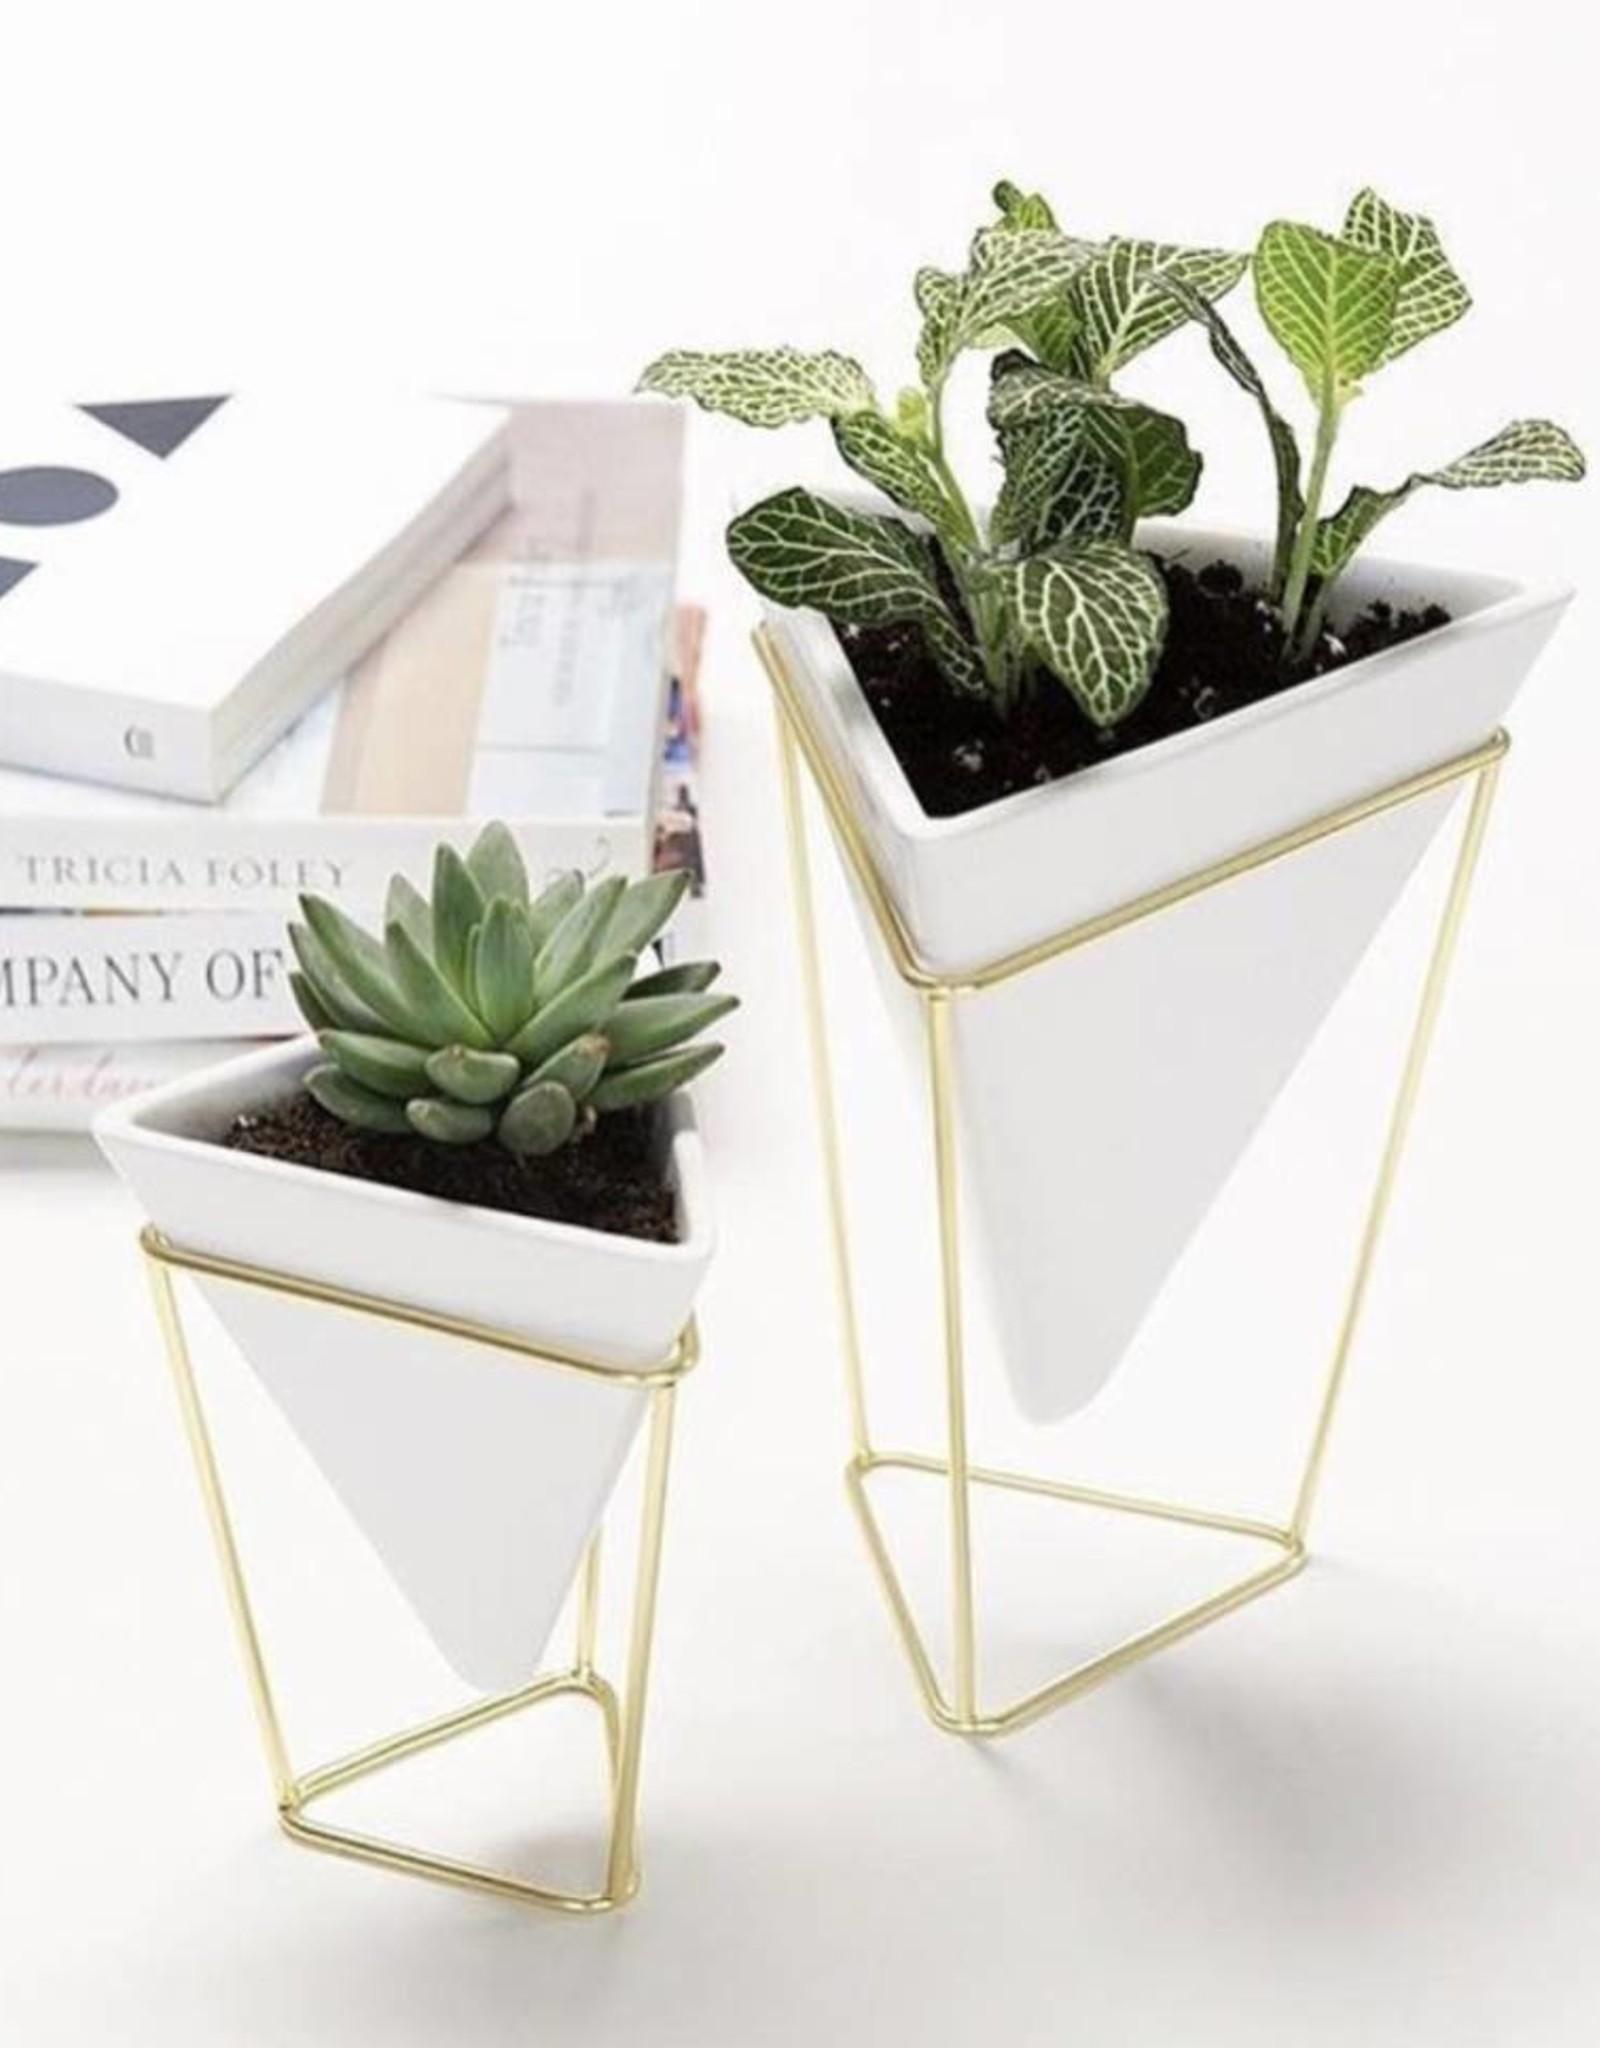 Umbra Umbra - Trigg desk set white - brass